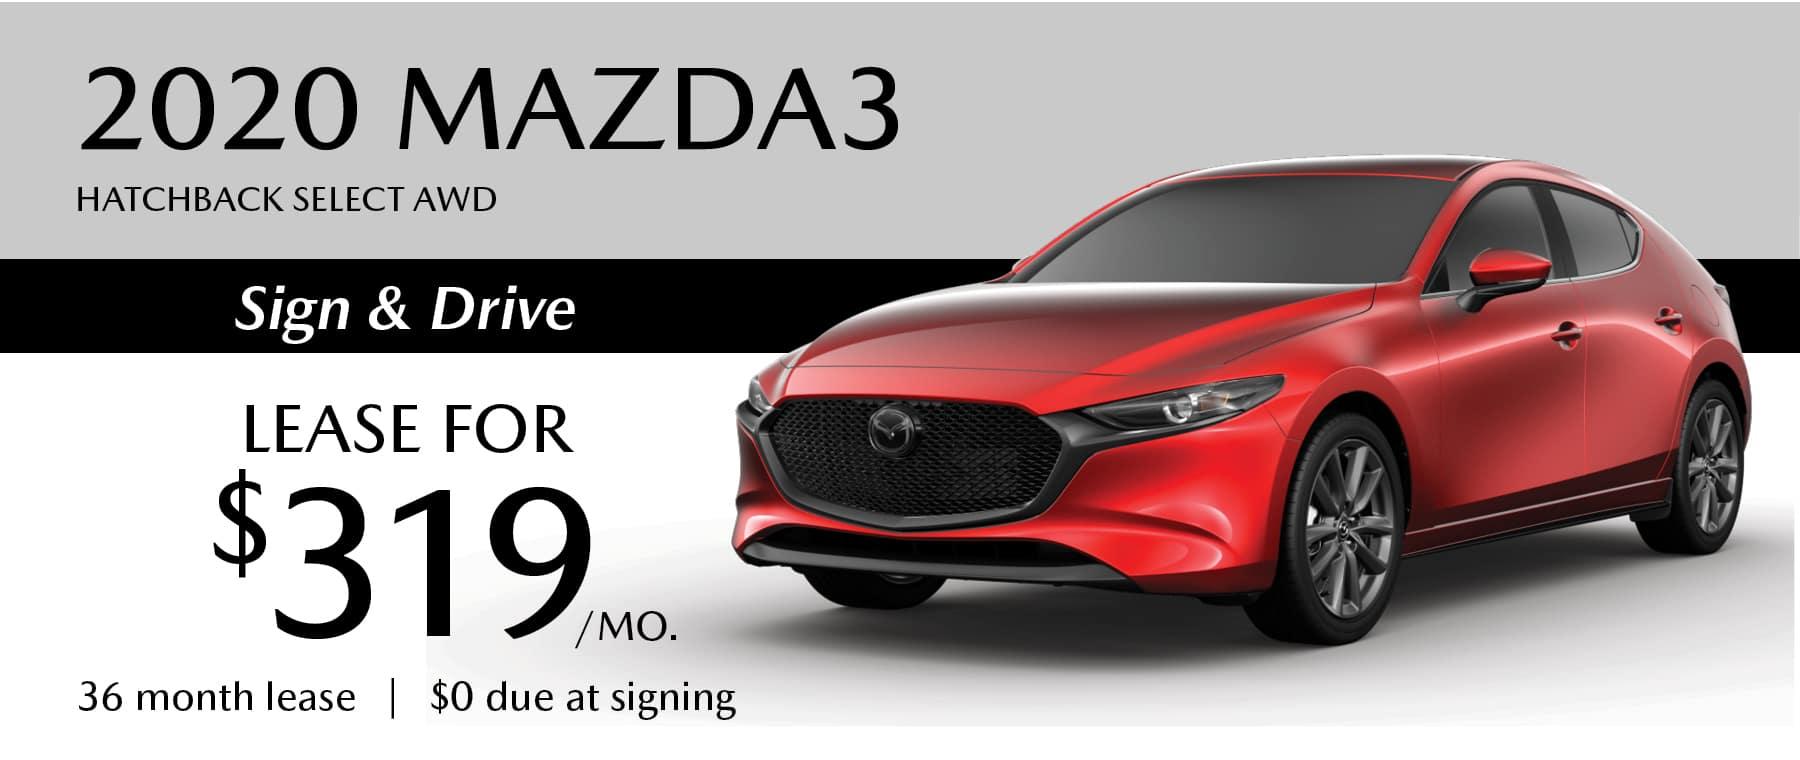 2020 Mazda3 Hatchback Select AWD Lease Offer